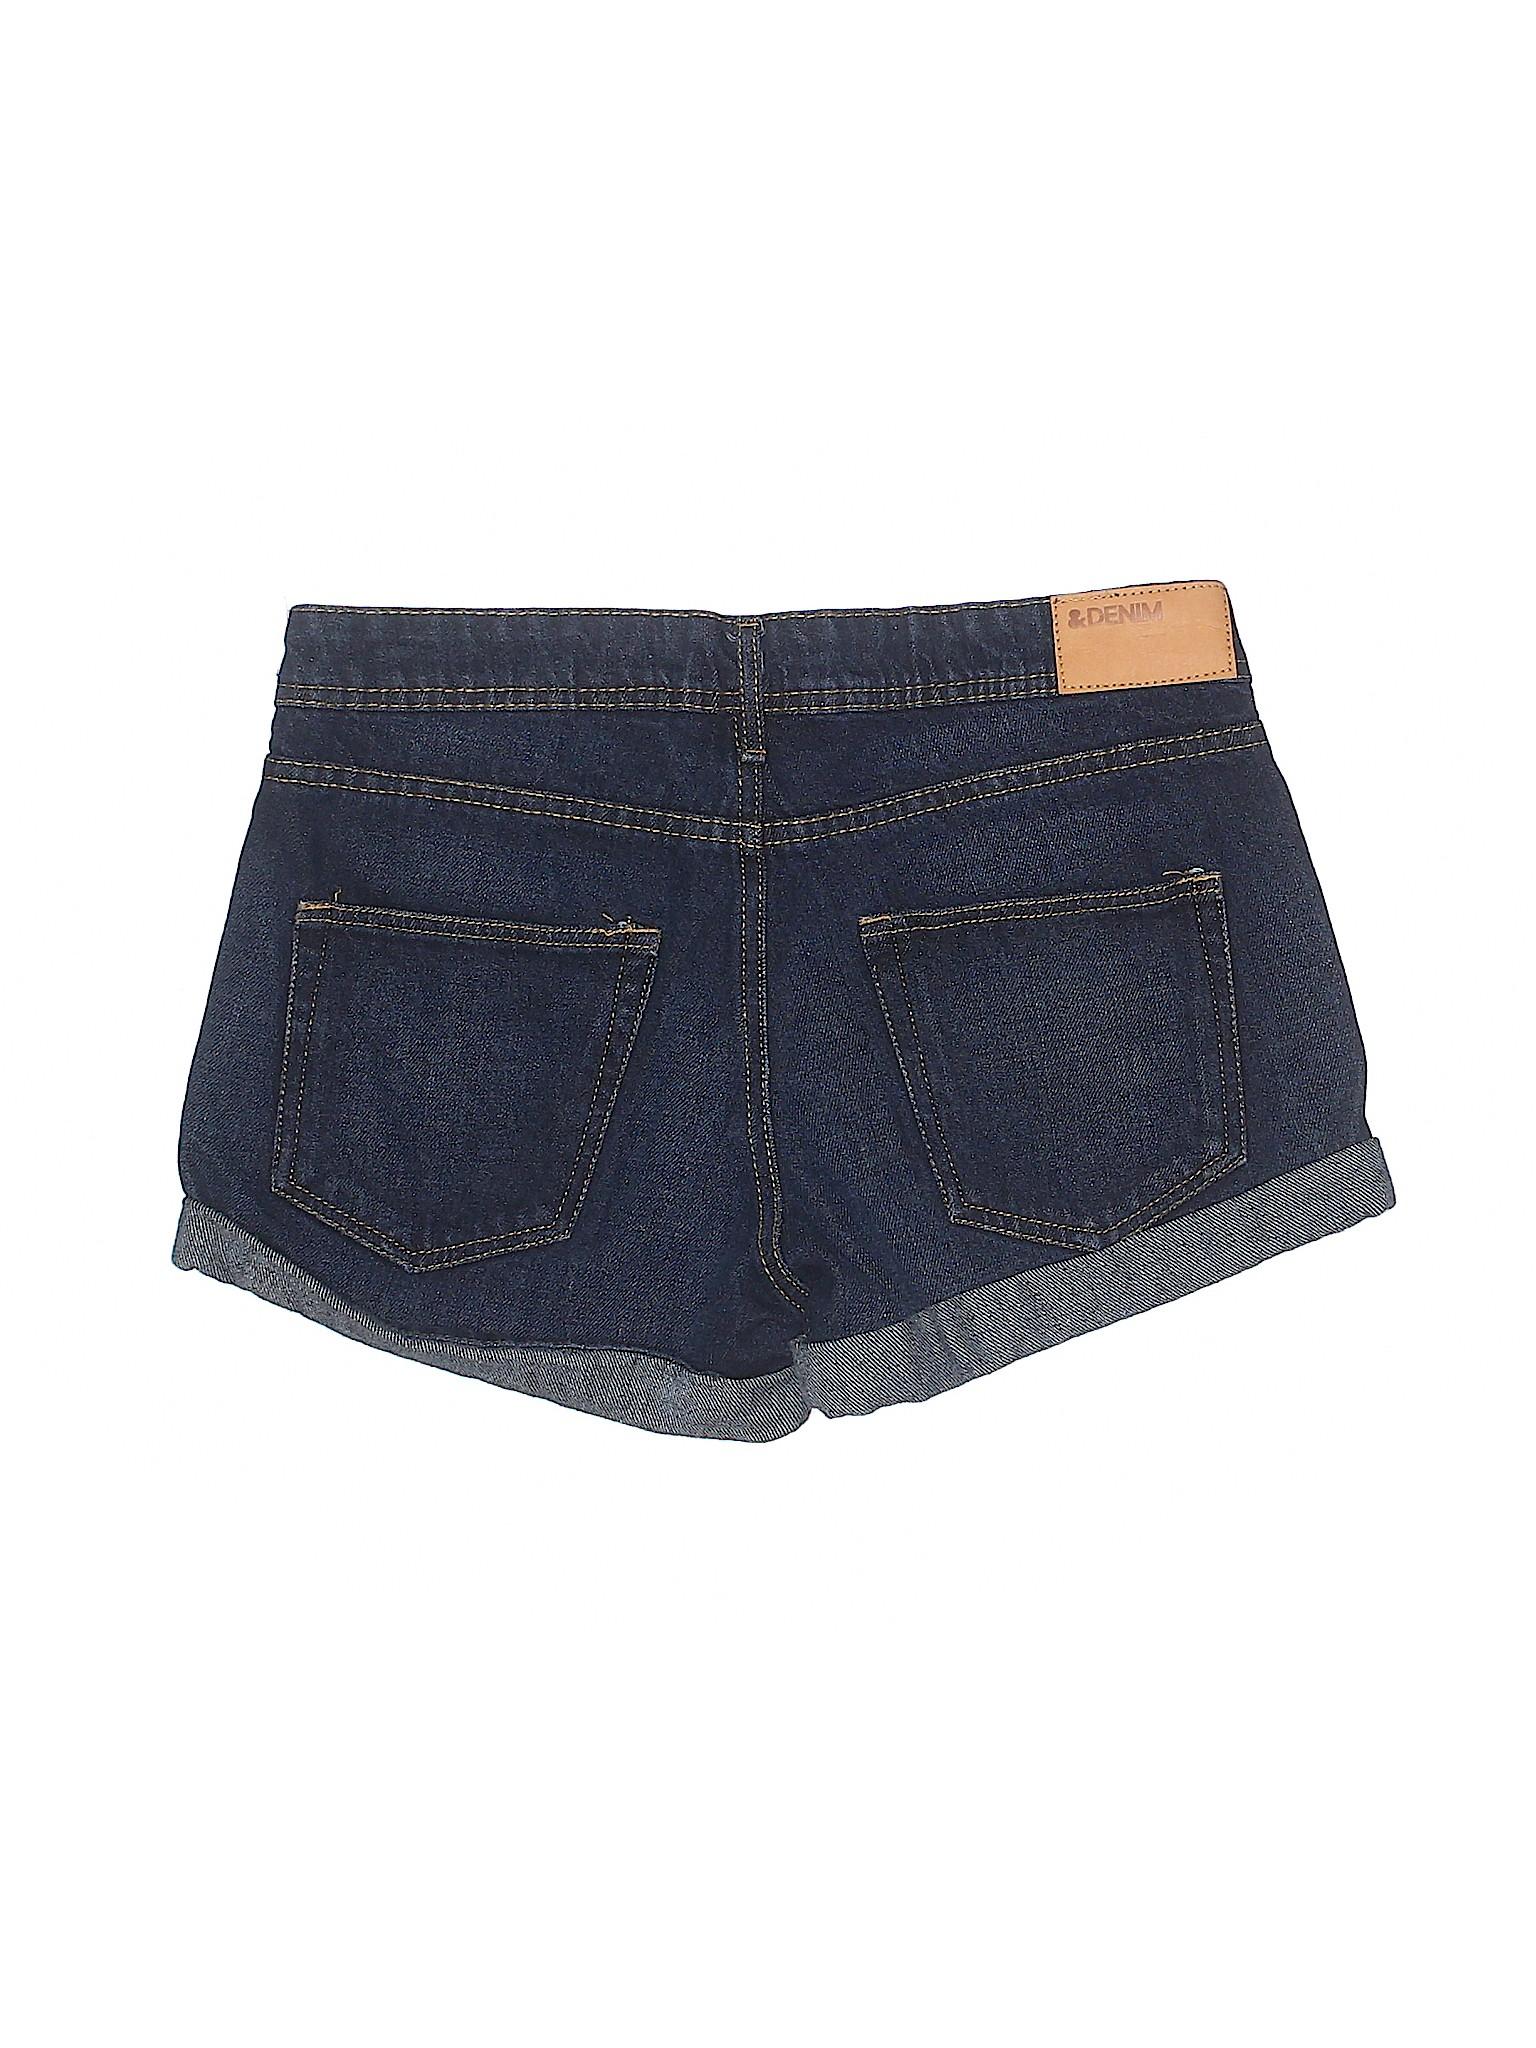 Boutique H amp;M Denim Shorts Boutique amp;M Denim H 6pqw8HUzx